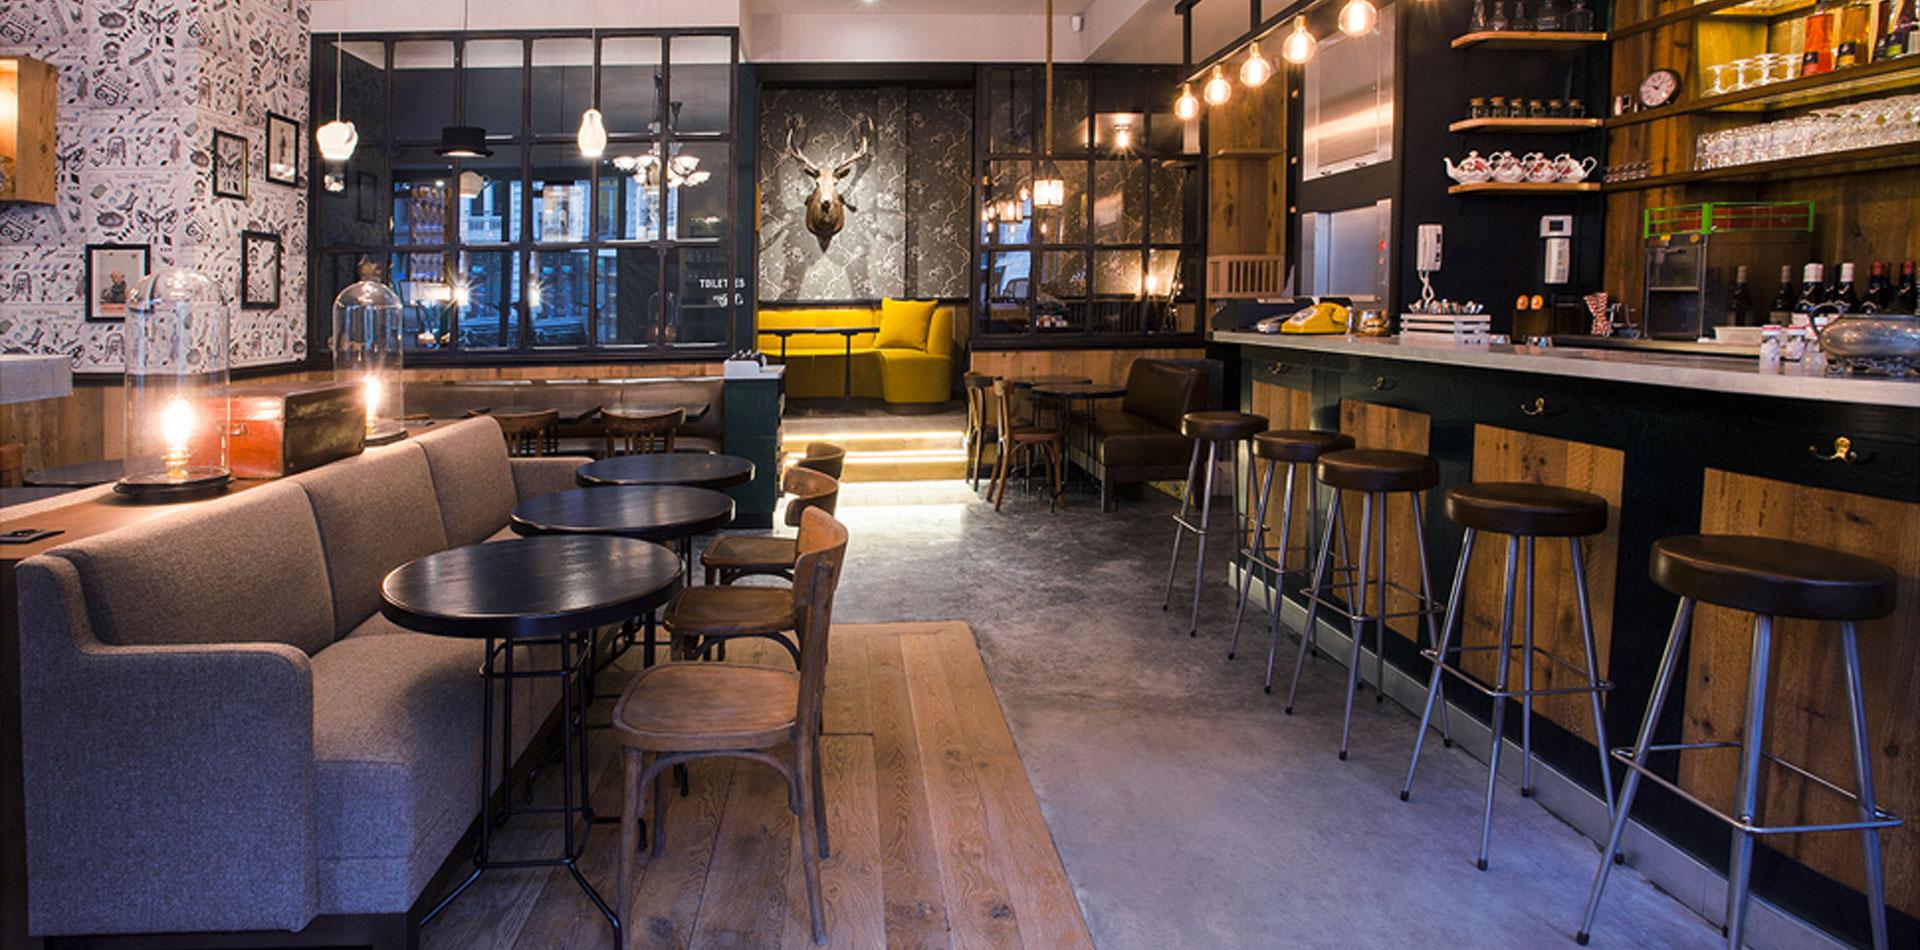 Cafe Le Veronese Paris